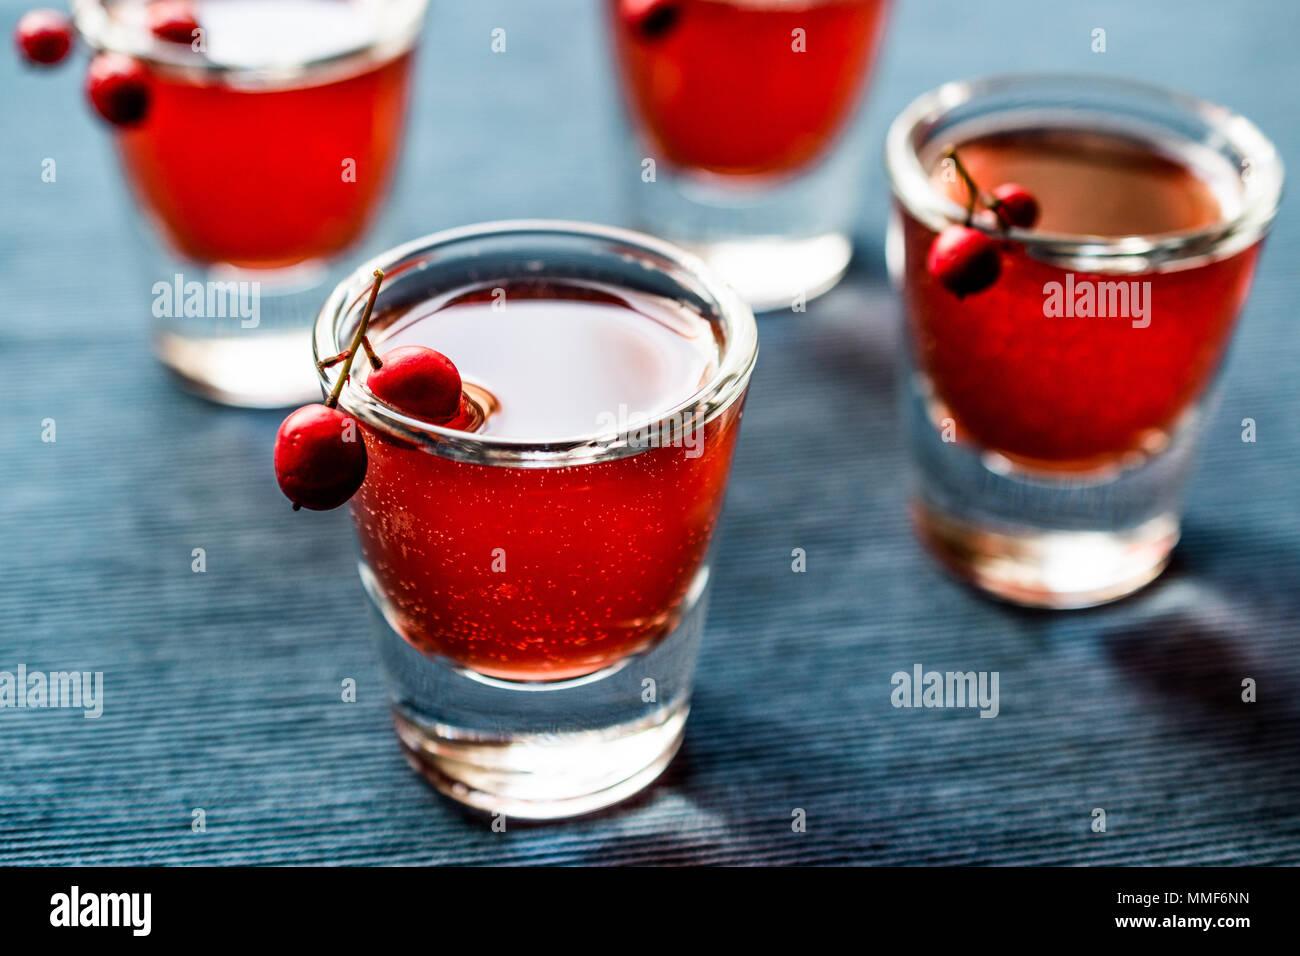 Cranberry Cocktail mit Wodka Shot. Beverage Konzept. Stockbild